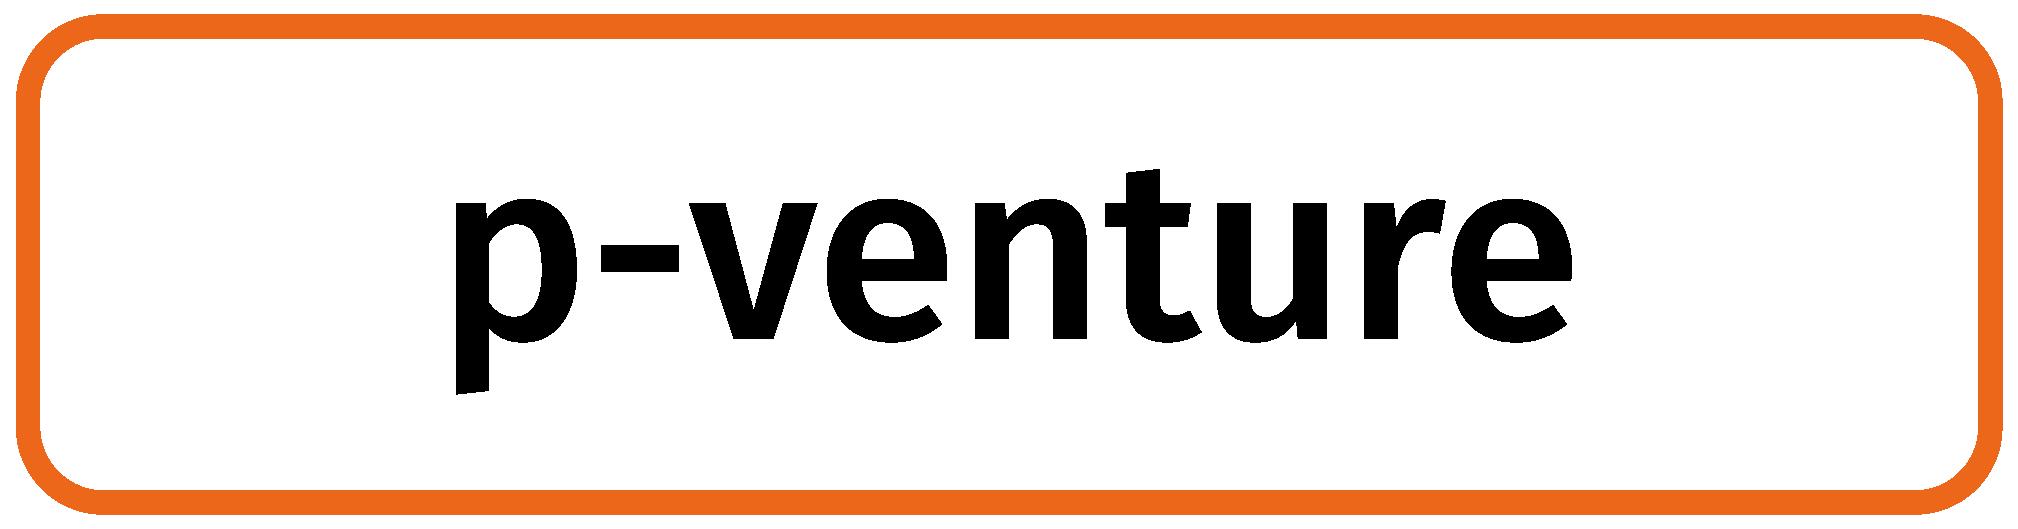 p-venture - Logo - Prof. Norbert Pohlmann